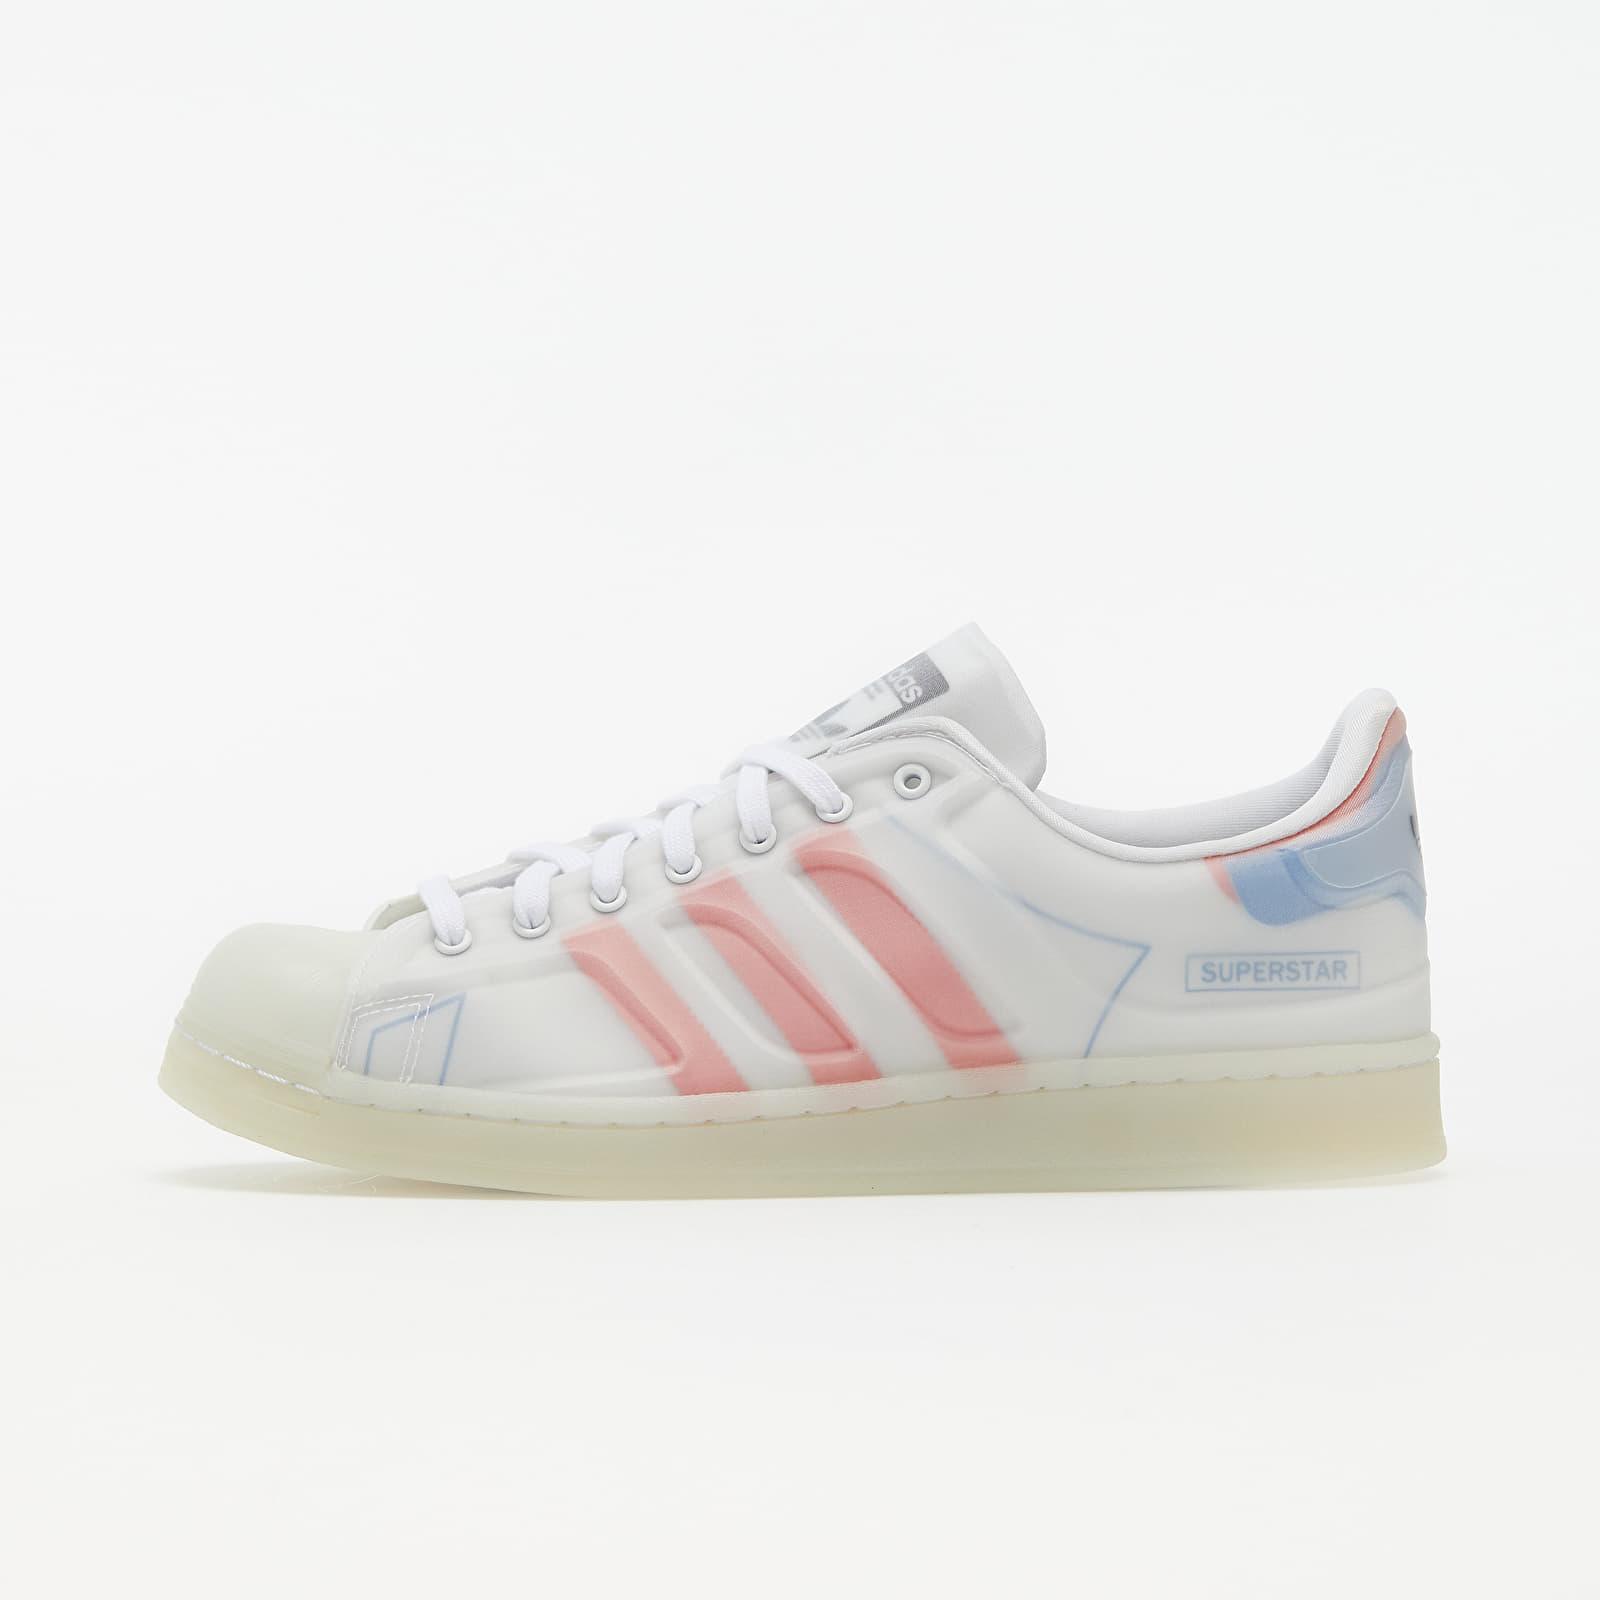 adidas Superstar Futureshell Ftwr White/ Semi Solar Red/ Bright Blue EUR 40